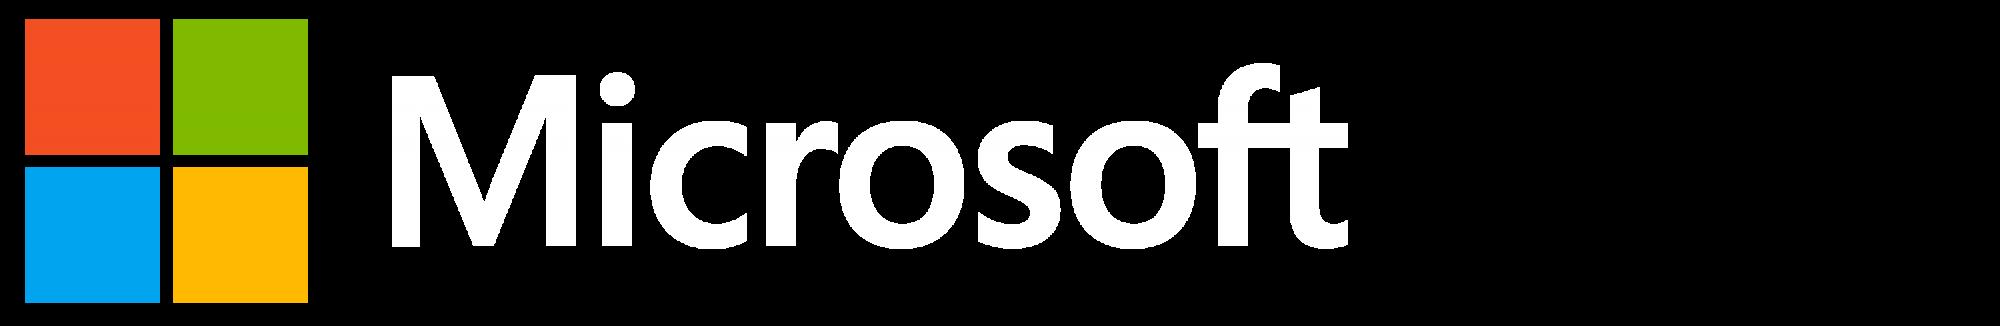 Microsoft Virtual Helpdesk